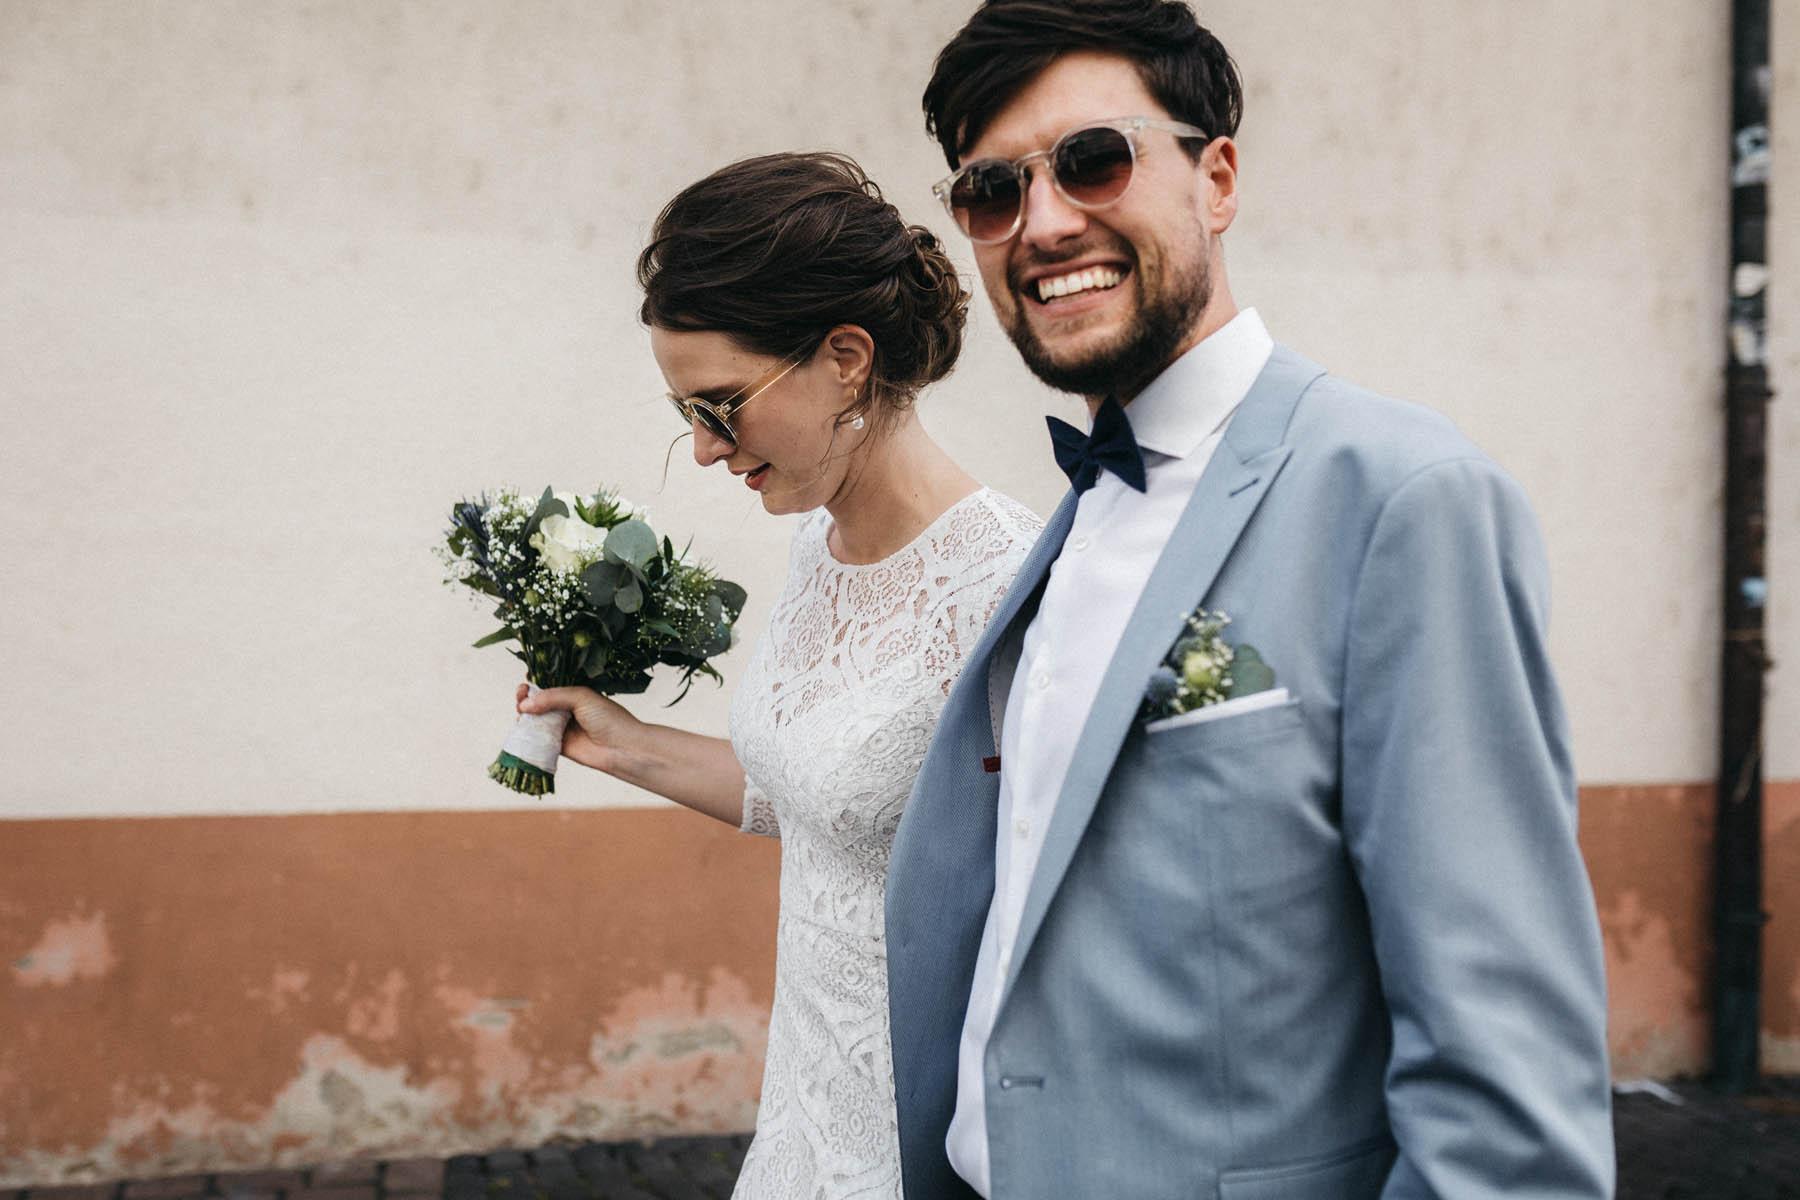 raissa simon fotografie elopement freiburg standesamt 044 - Julia + Tobias